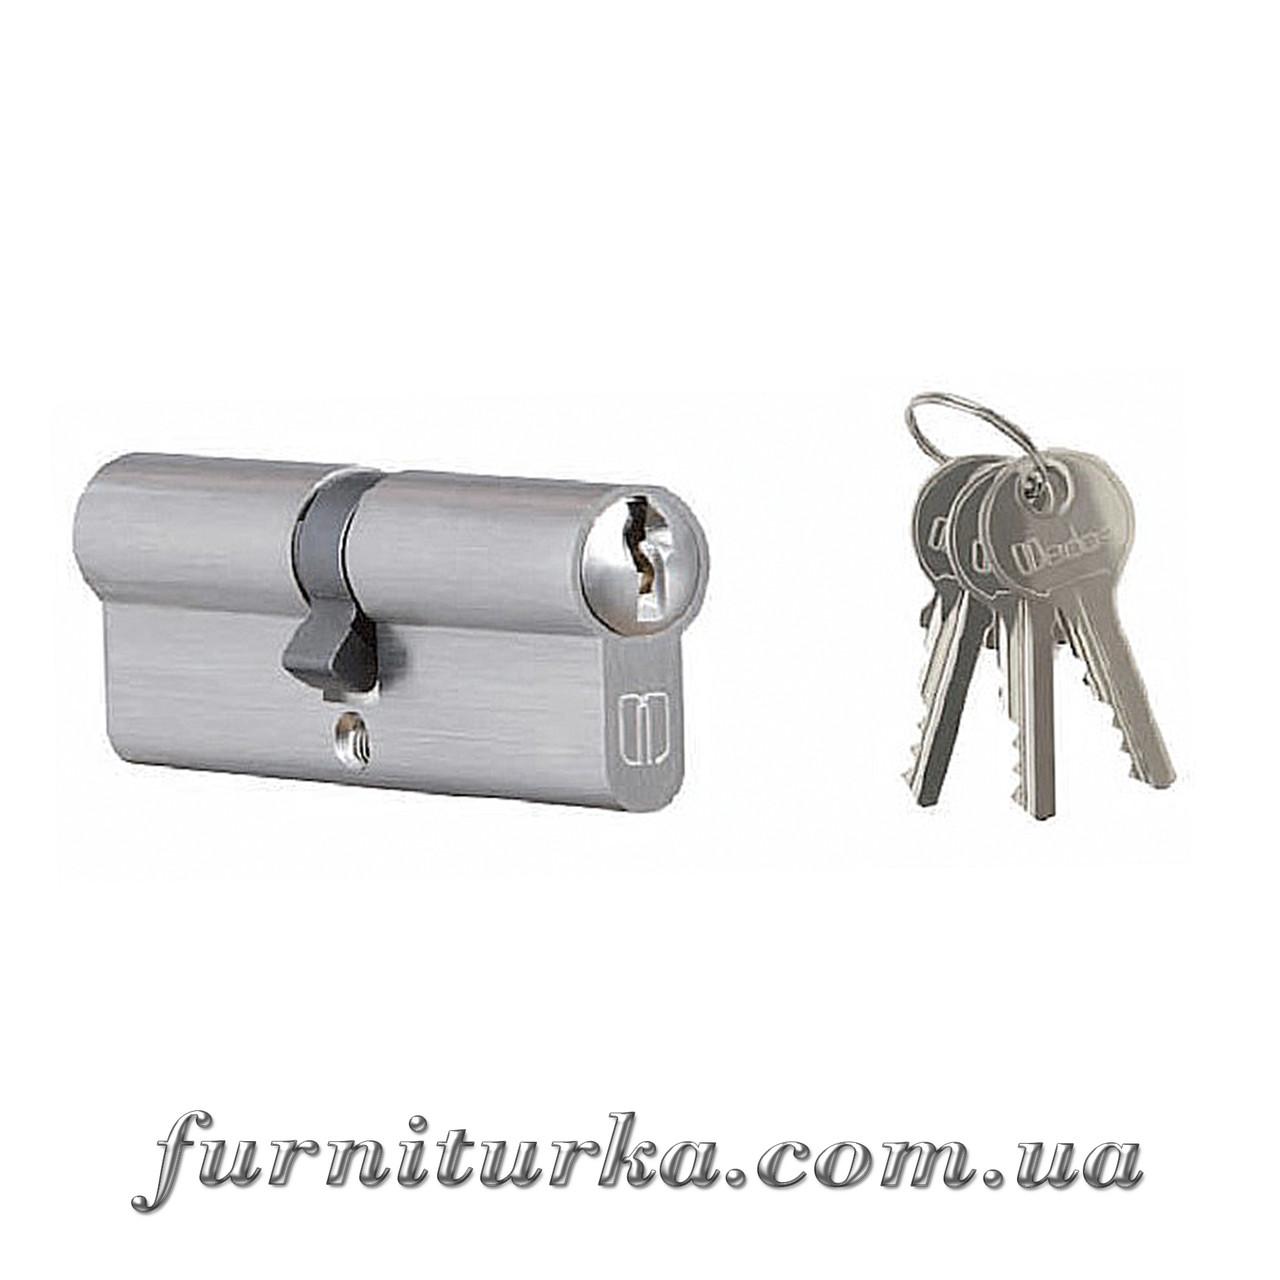 Сердцевина Medos 40/40 (ключ-ключ)